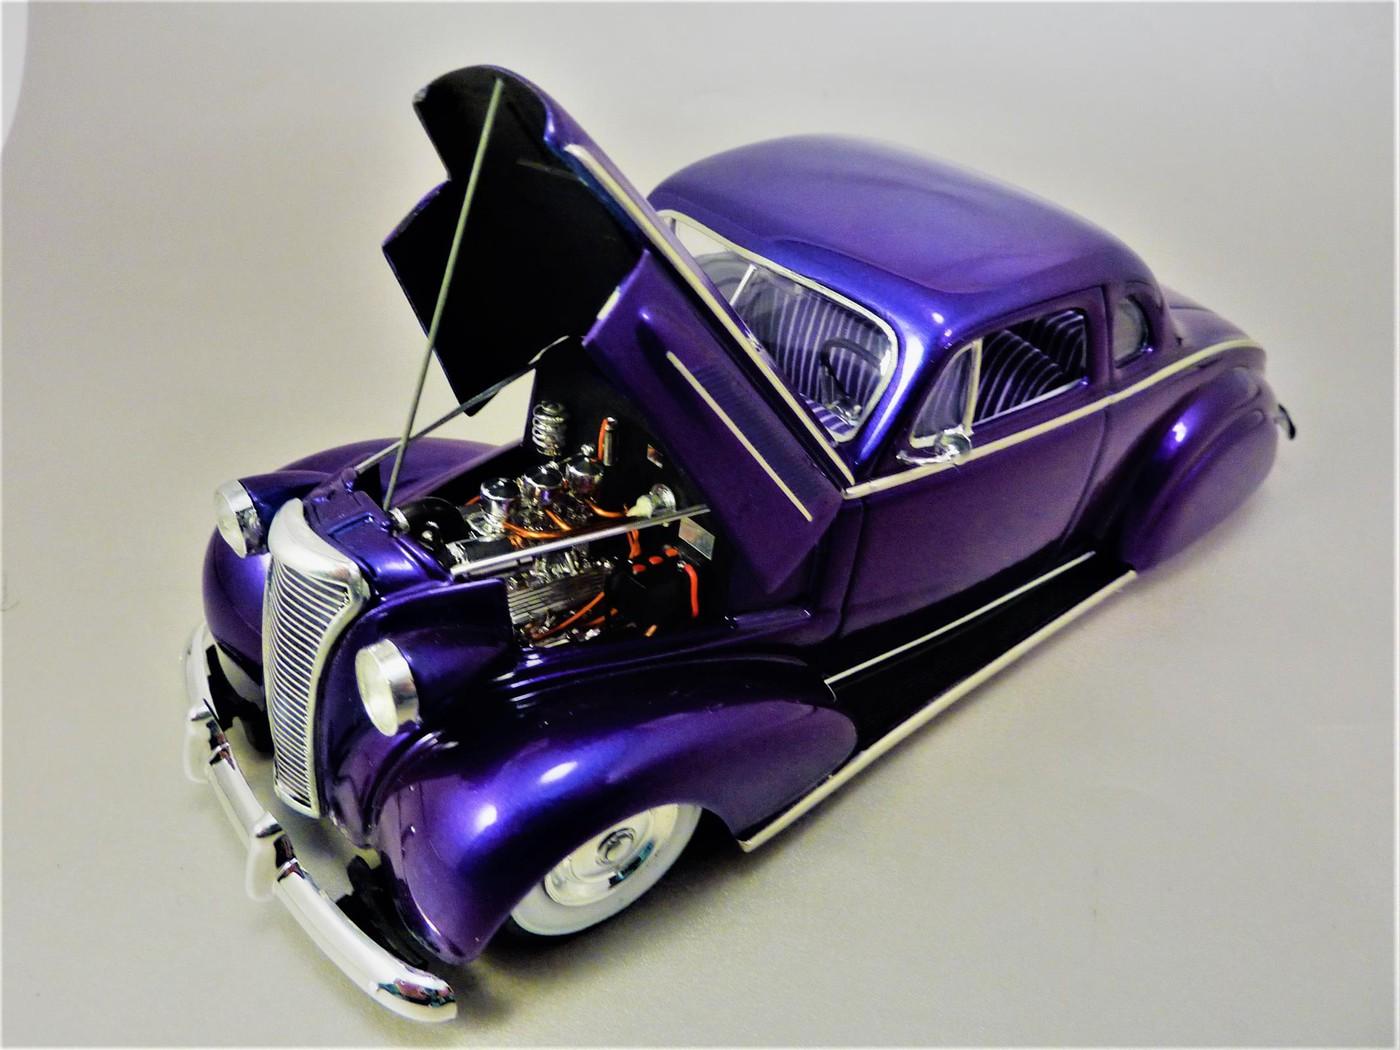 Projet Chevy 37 custom terminée  - Page 2 Photo66-vi